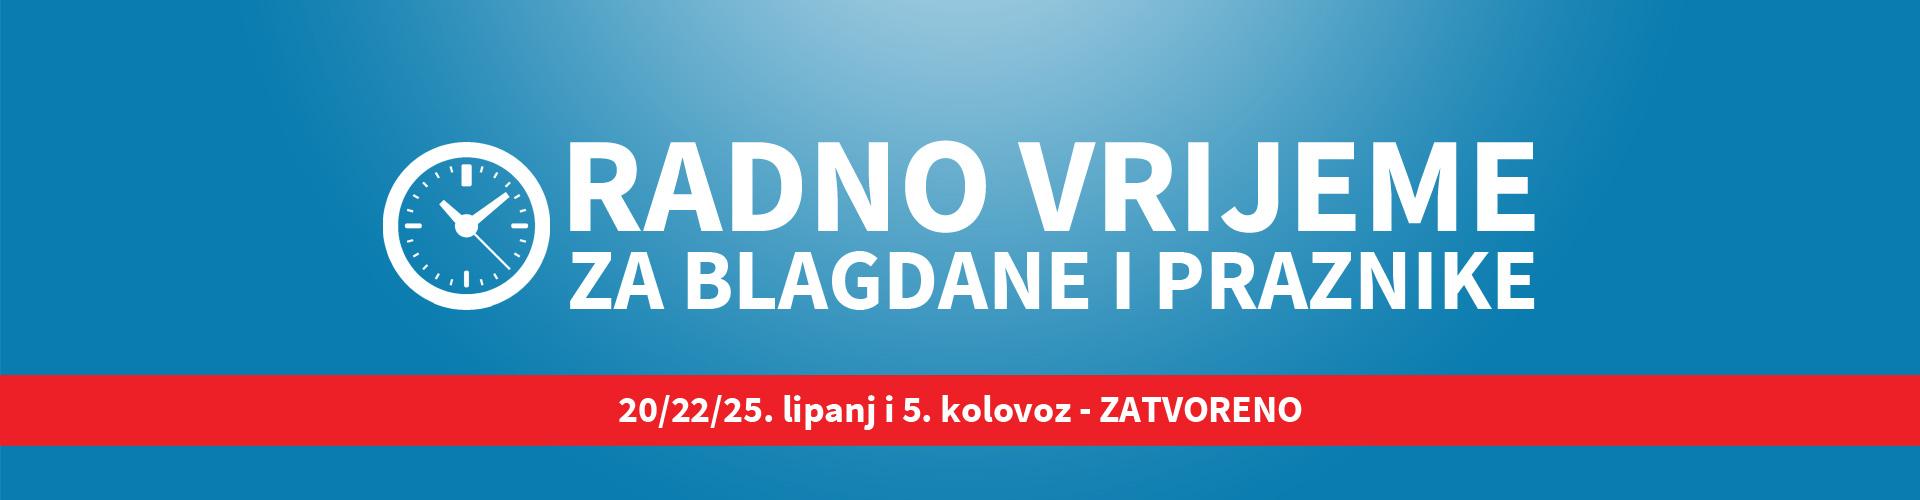 https://www.kimicommerce.hr/Repository/Banners/radno-vrijeme-praznik-blagdan-062019.jpg